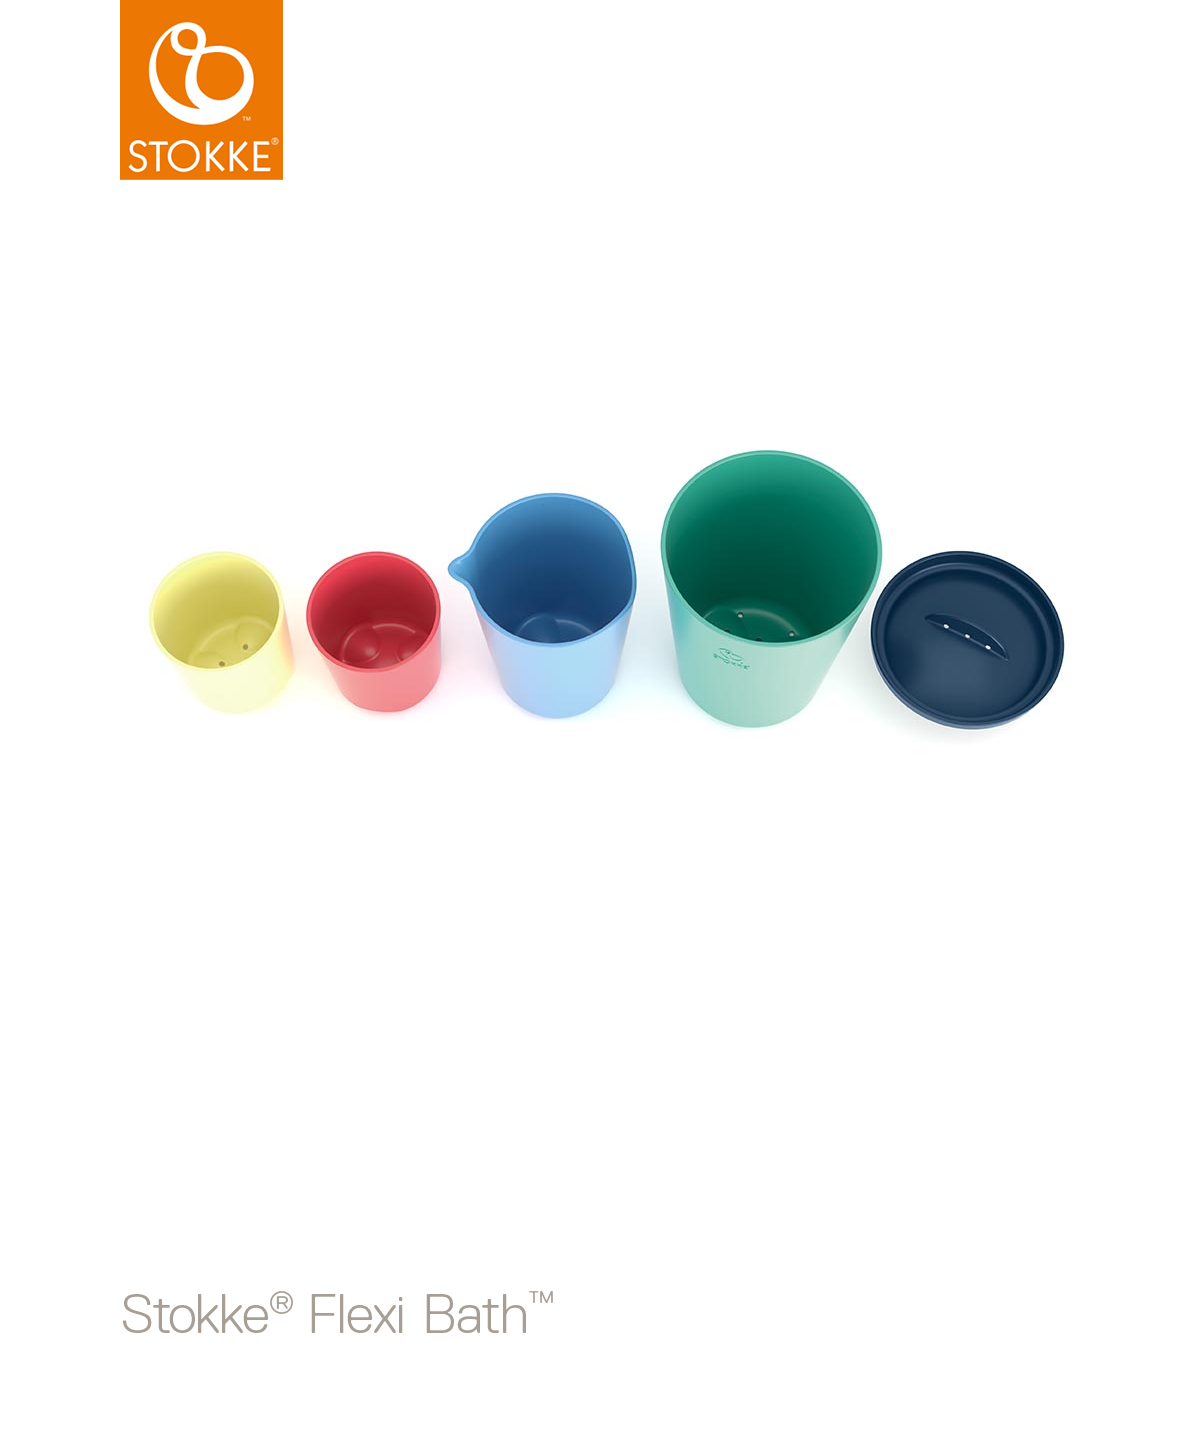 Stokke Flexi Bath разноцветные игрушечные стаканчики